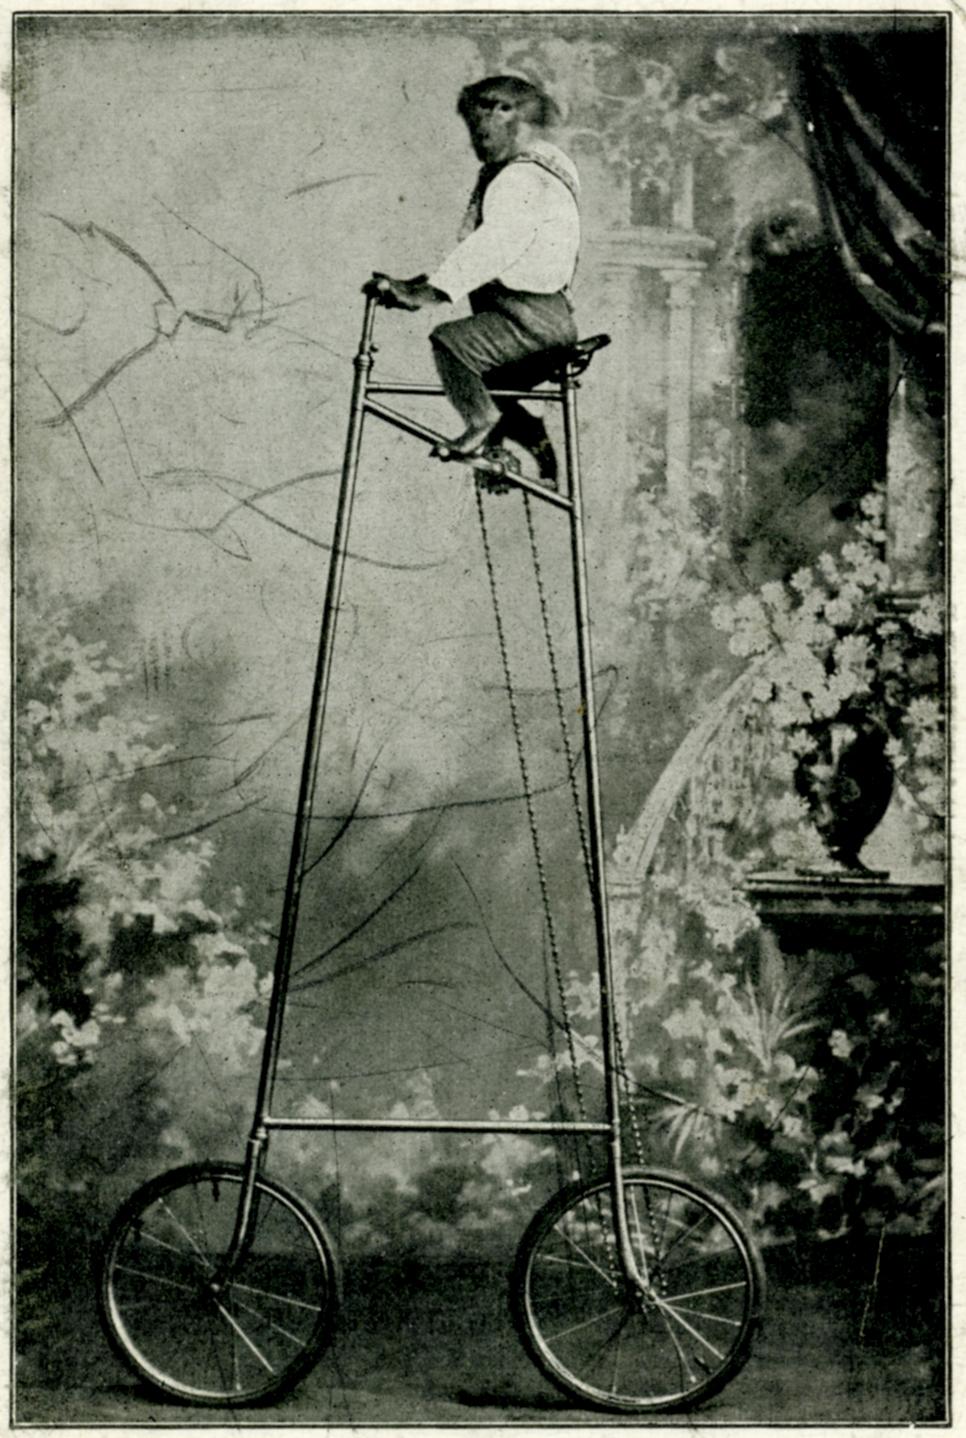 monkey-ape-tallbike-bikekitchen-vienna-radpropaganda